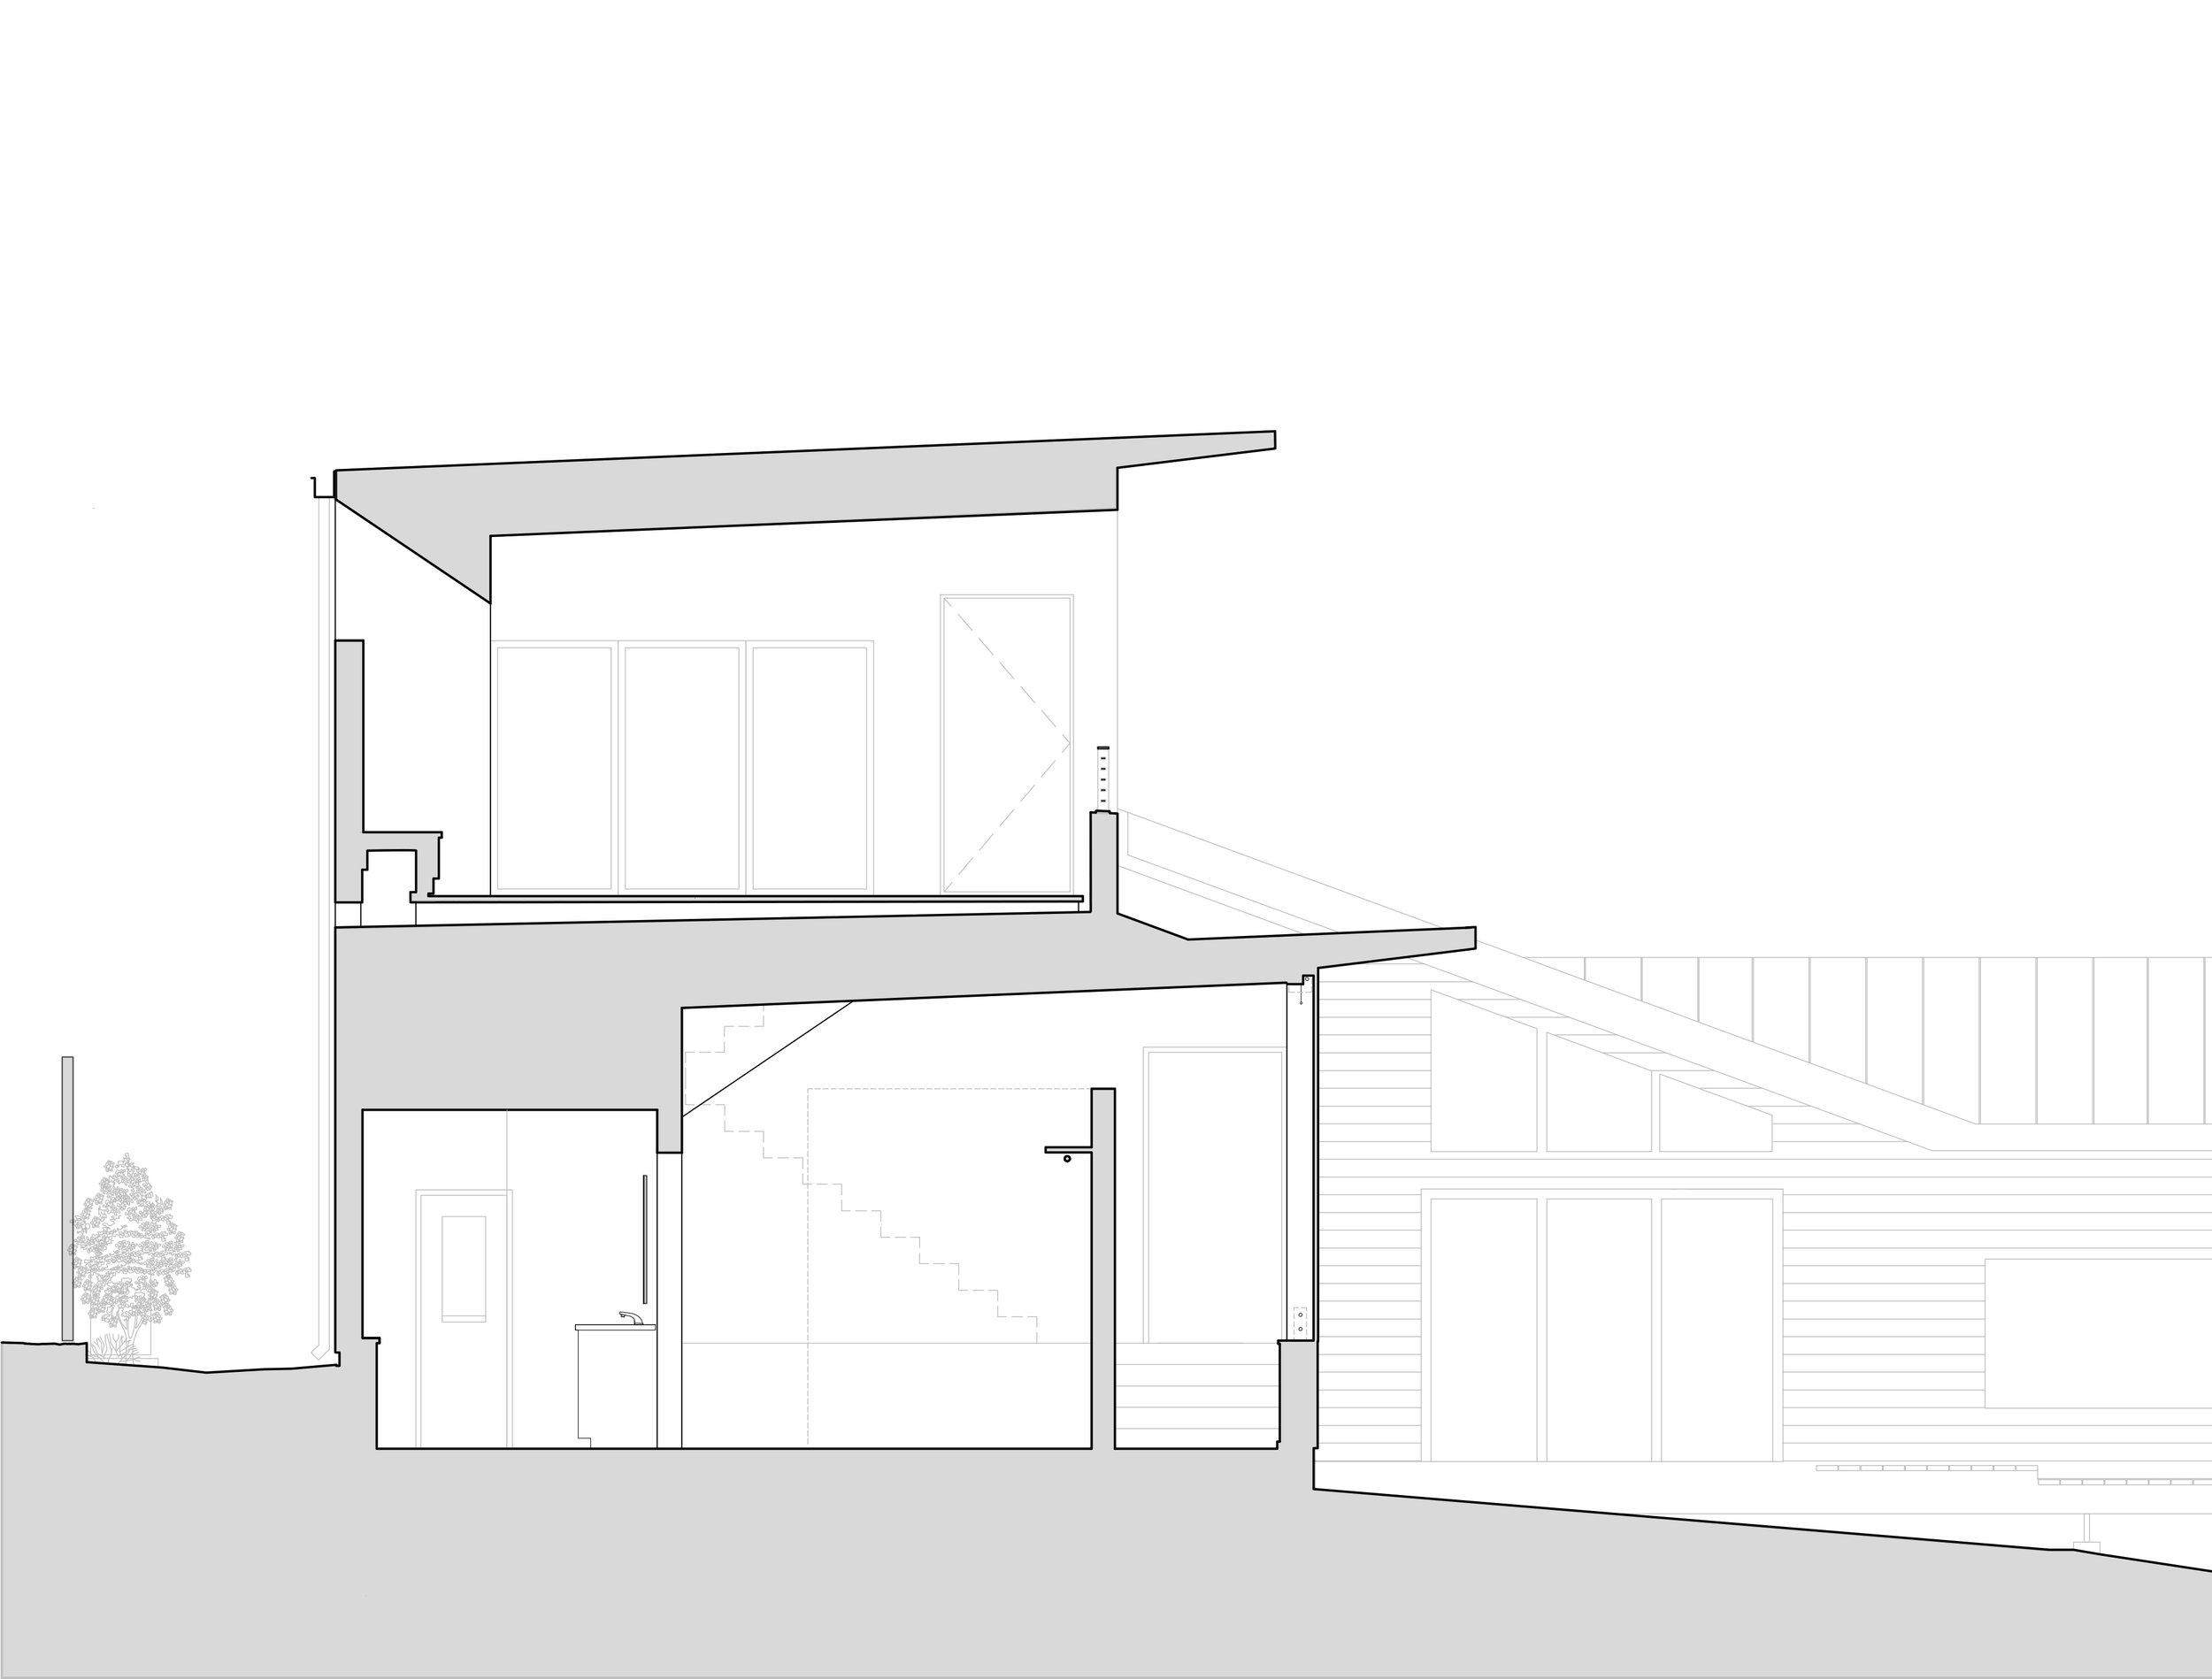 06 Barton Hills Addition_section 2.jpg